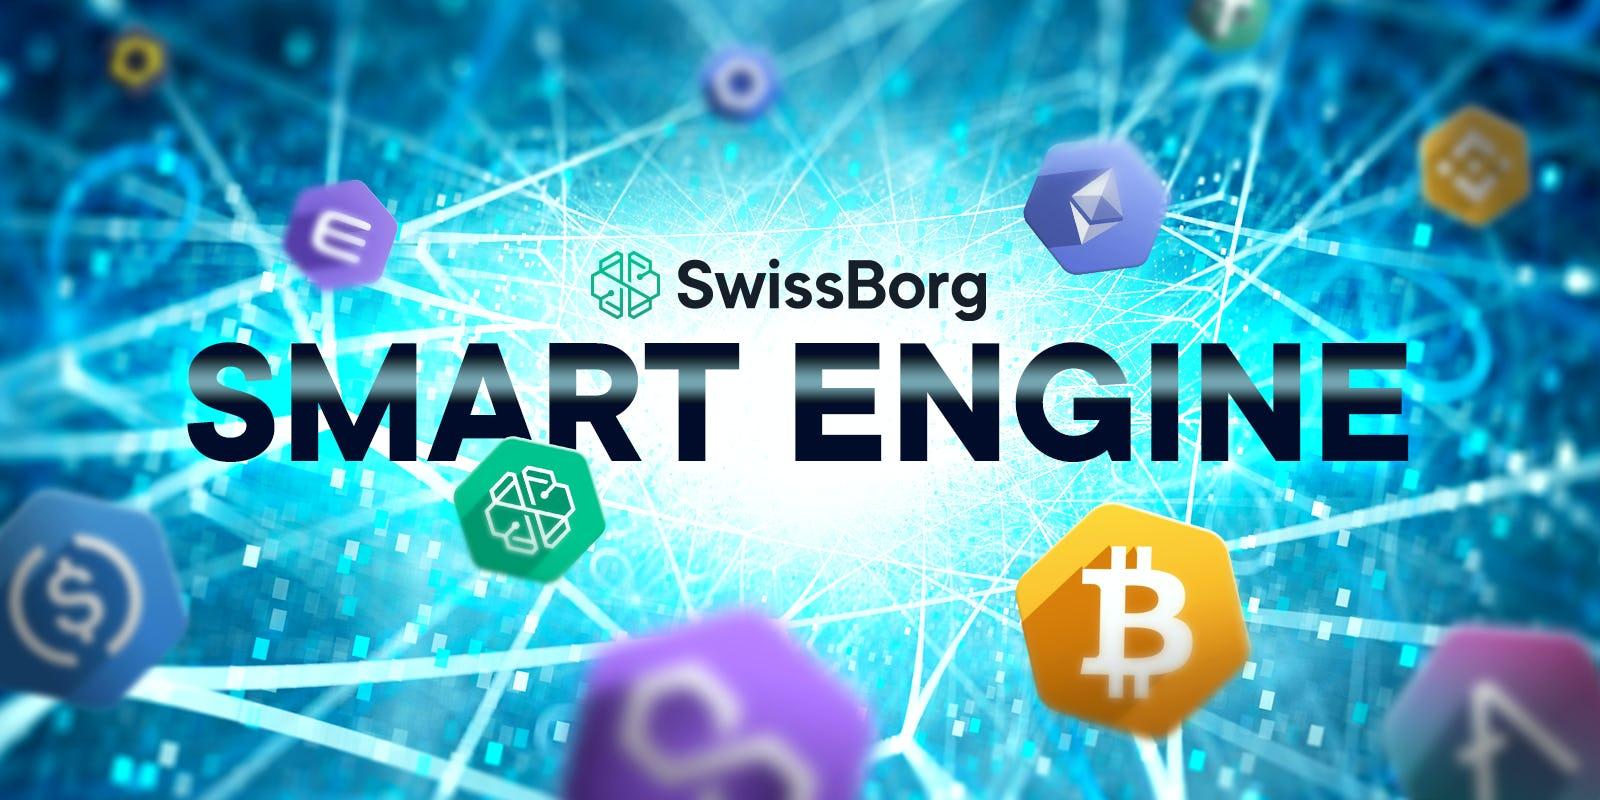 The Smart Engine in the SwissBorg app